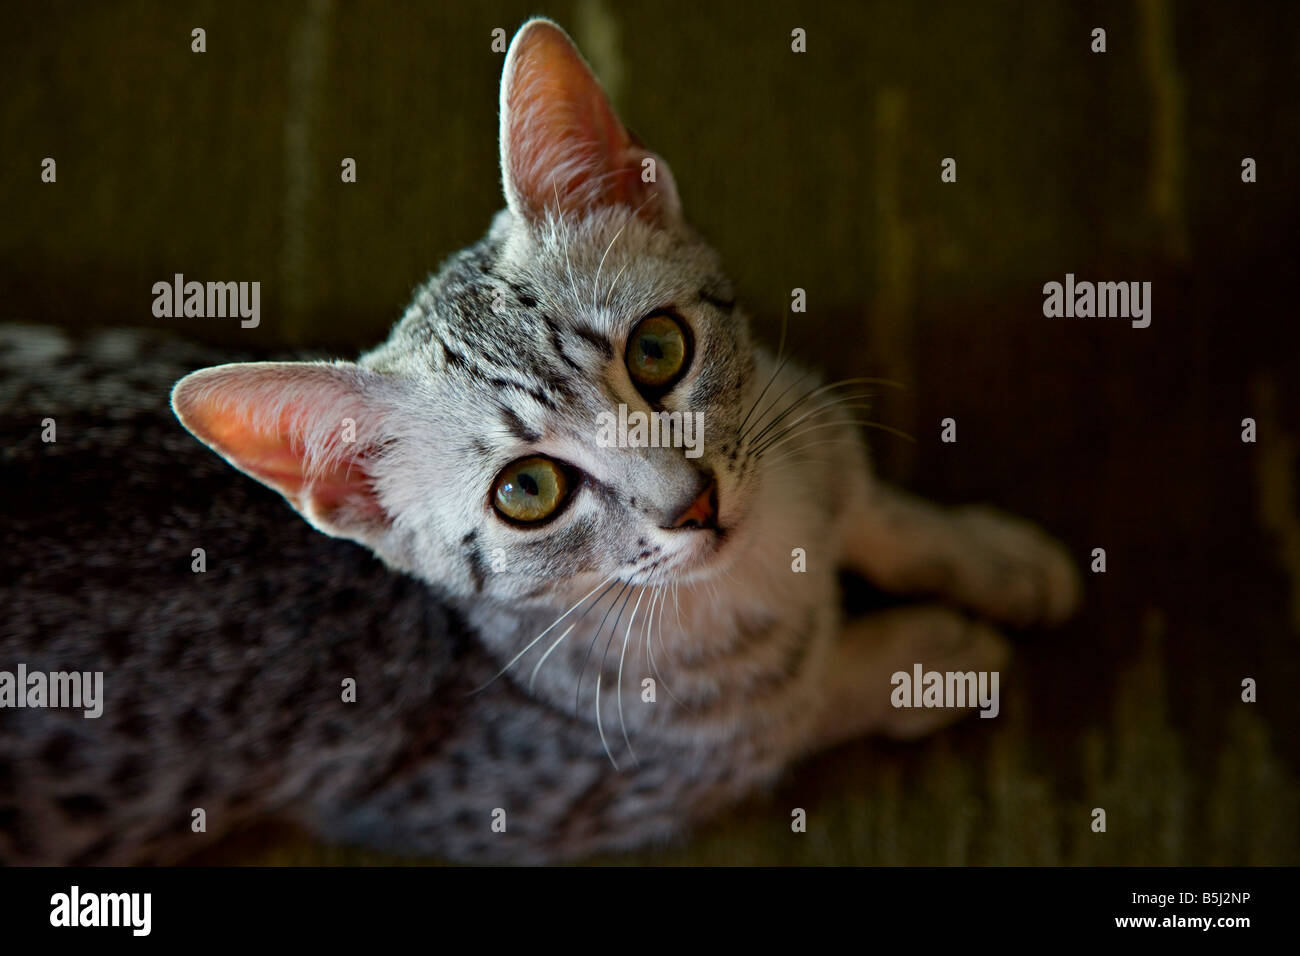 Egyptian Mau kitten - Stock Image